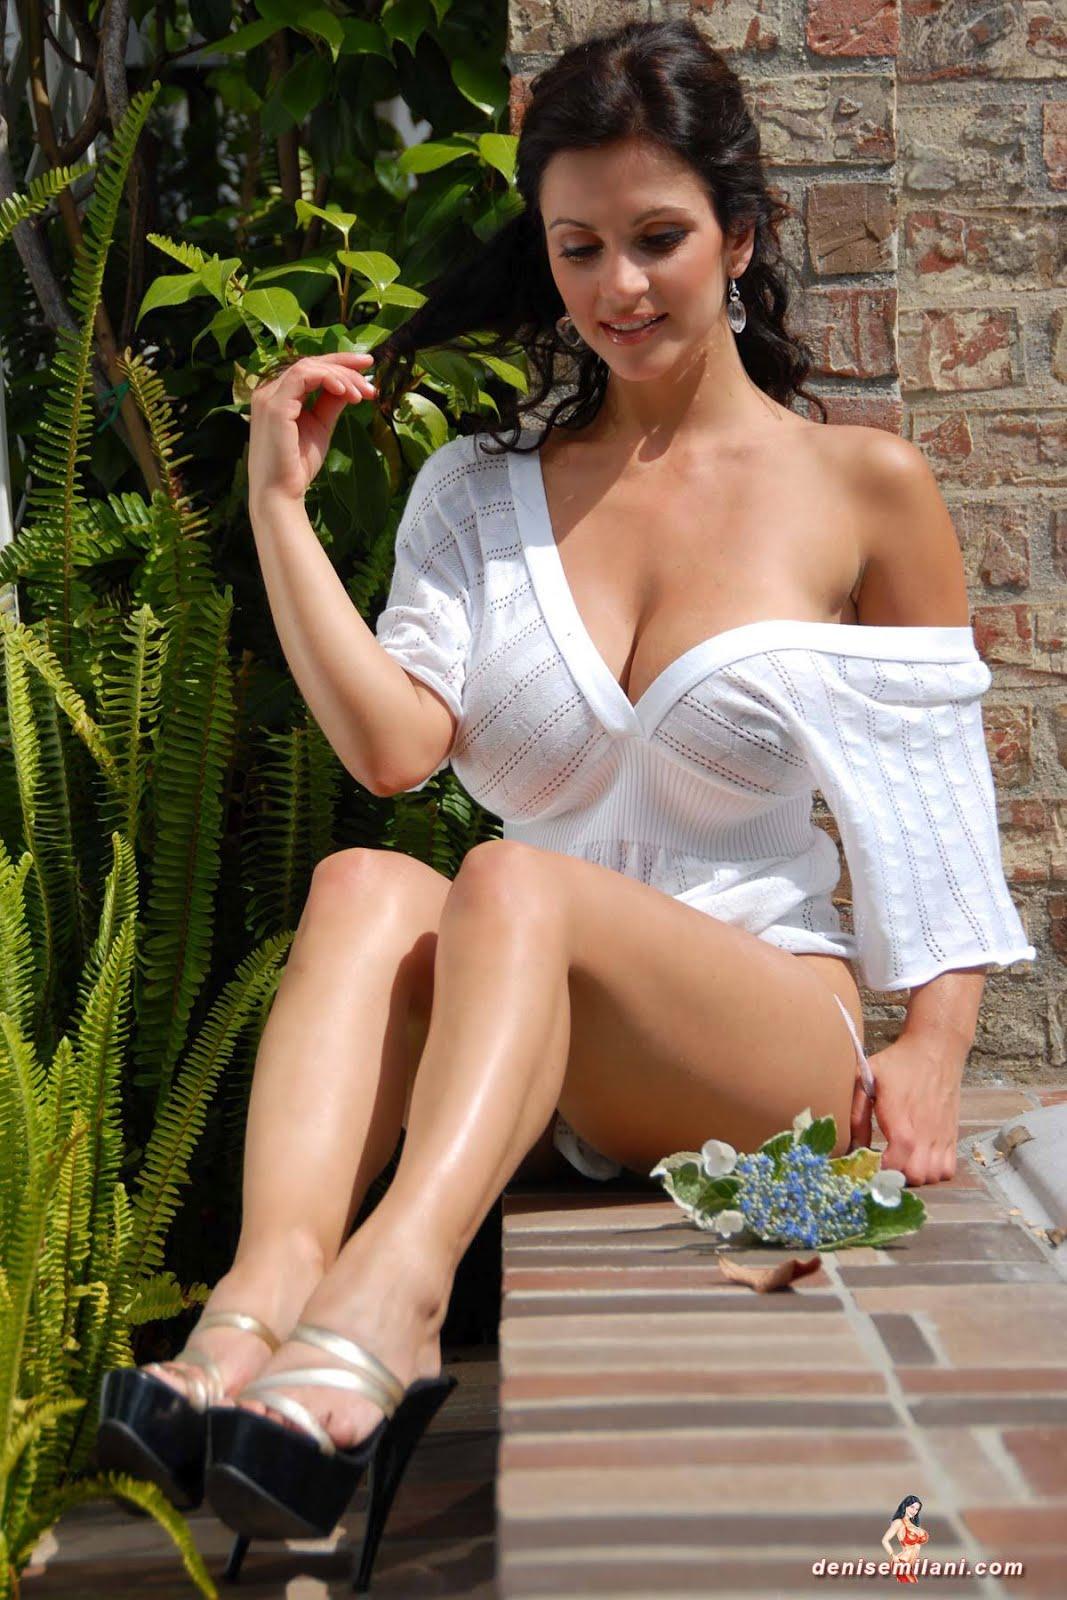 Denise Milani hot bikni latest Pictures Model stills 2012 | Denise ... Flora Saini